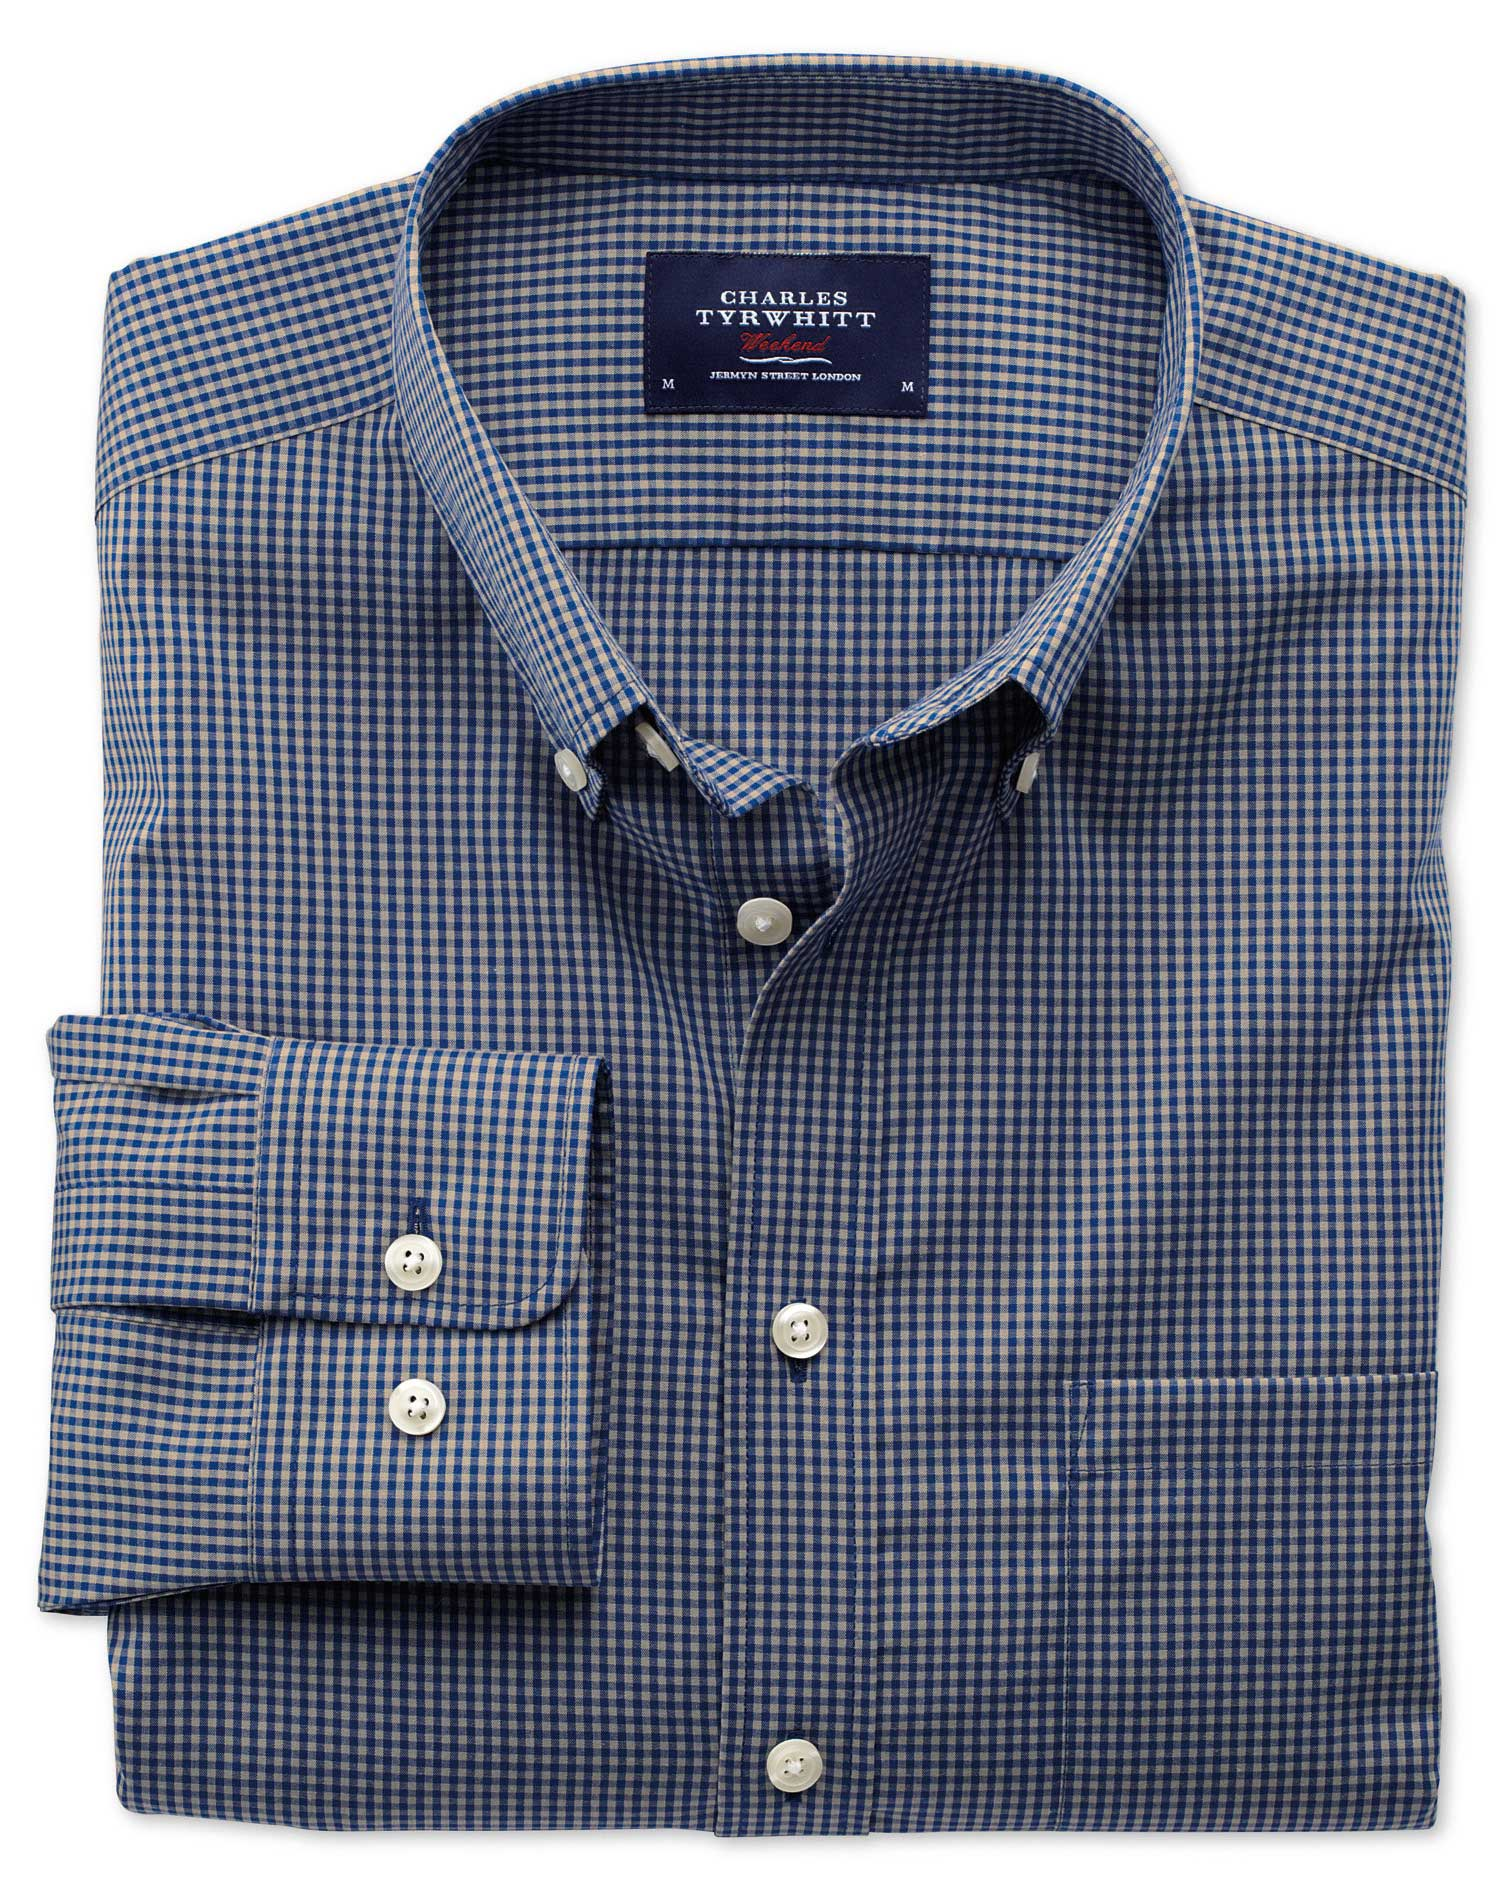 Slim Fit Non-Iron Poplin Blue and Grey Check Cotton Shirt Single Cuff Size XS by Charles Tyrwhitt